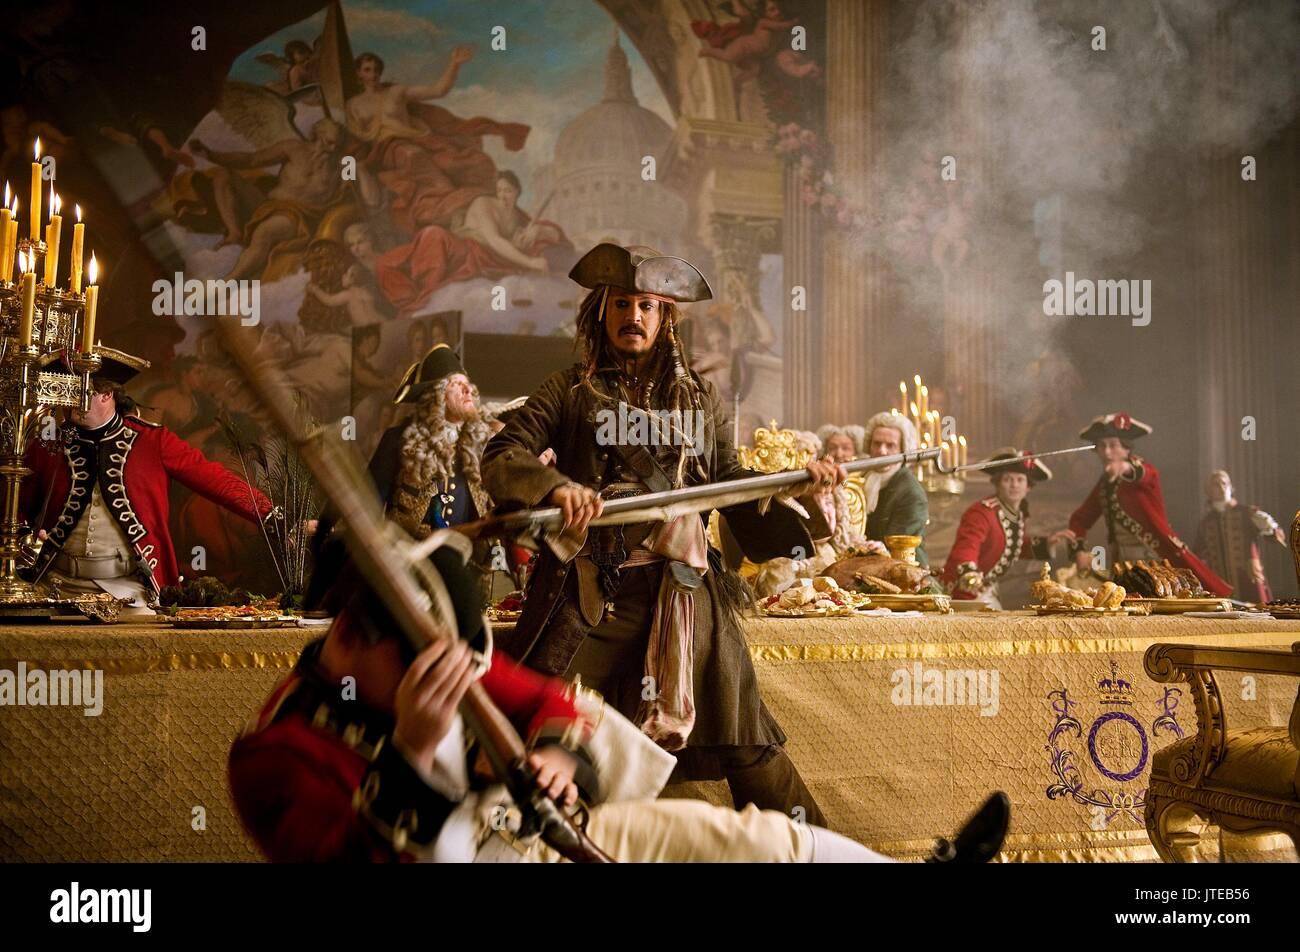 Johnny Depp Pirates Of The Caribbean On Stranger Tides Pirates Of Stock Photo Alamy